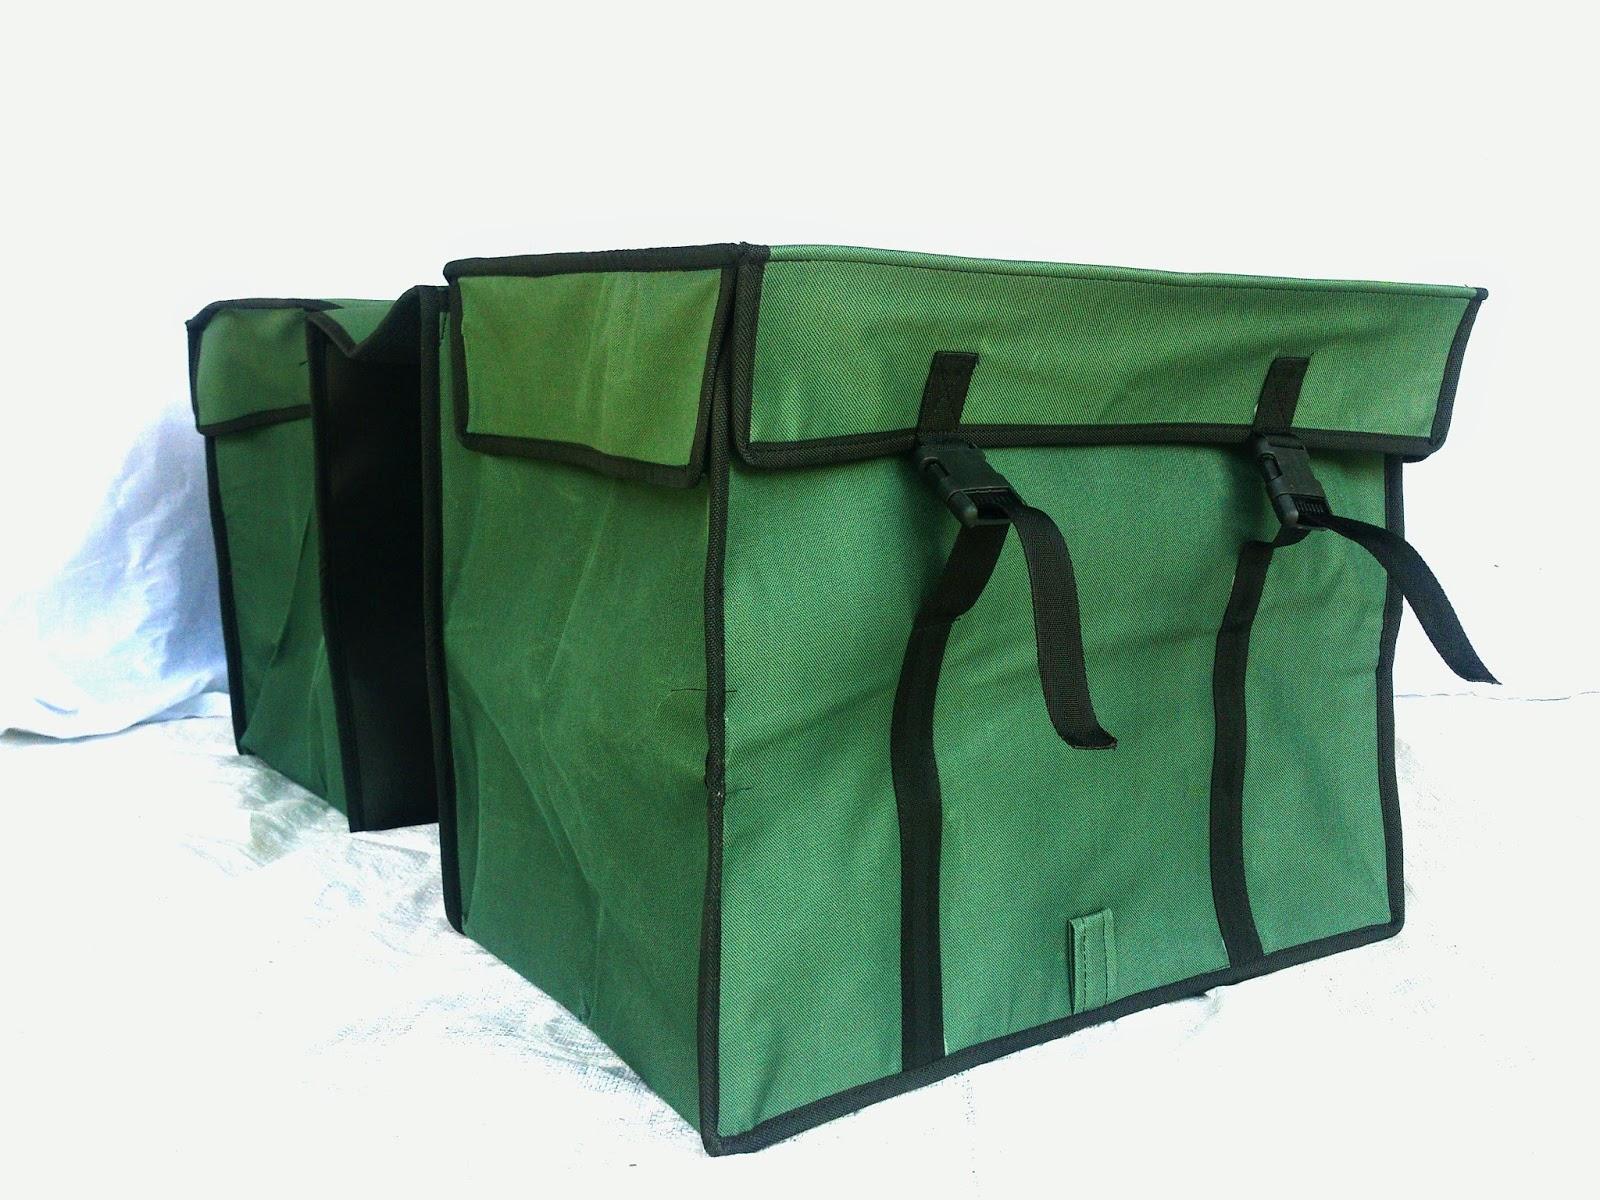 Jual Tas Motor Obrok Anti Air Lapis Spon Gudang Fashion Cover Biru Wikie  Cloud Design Ideas 59af773e61